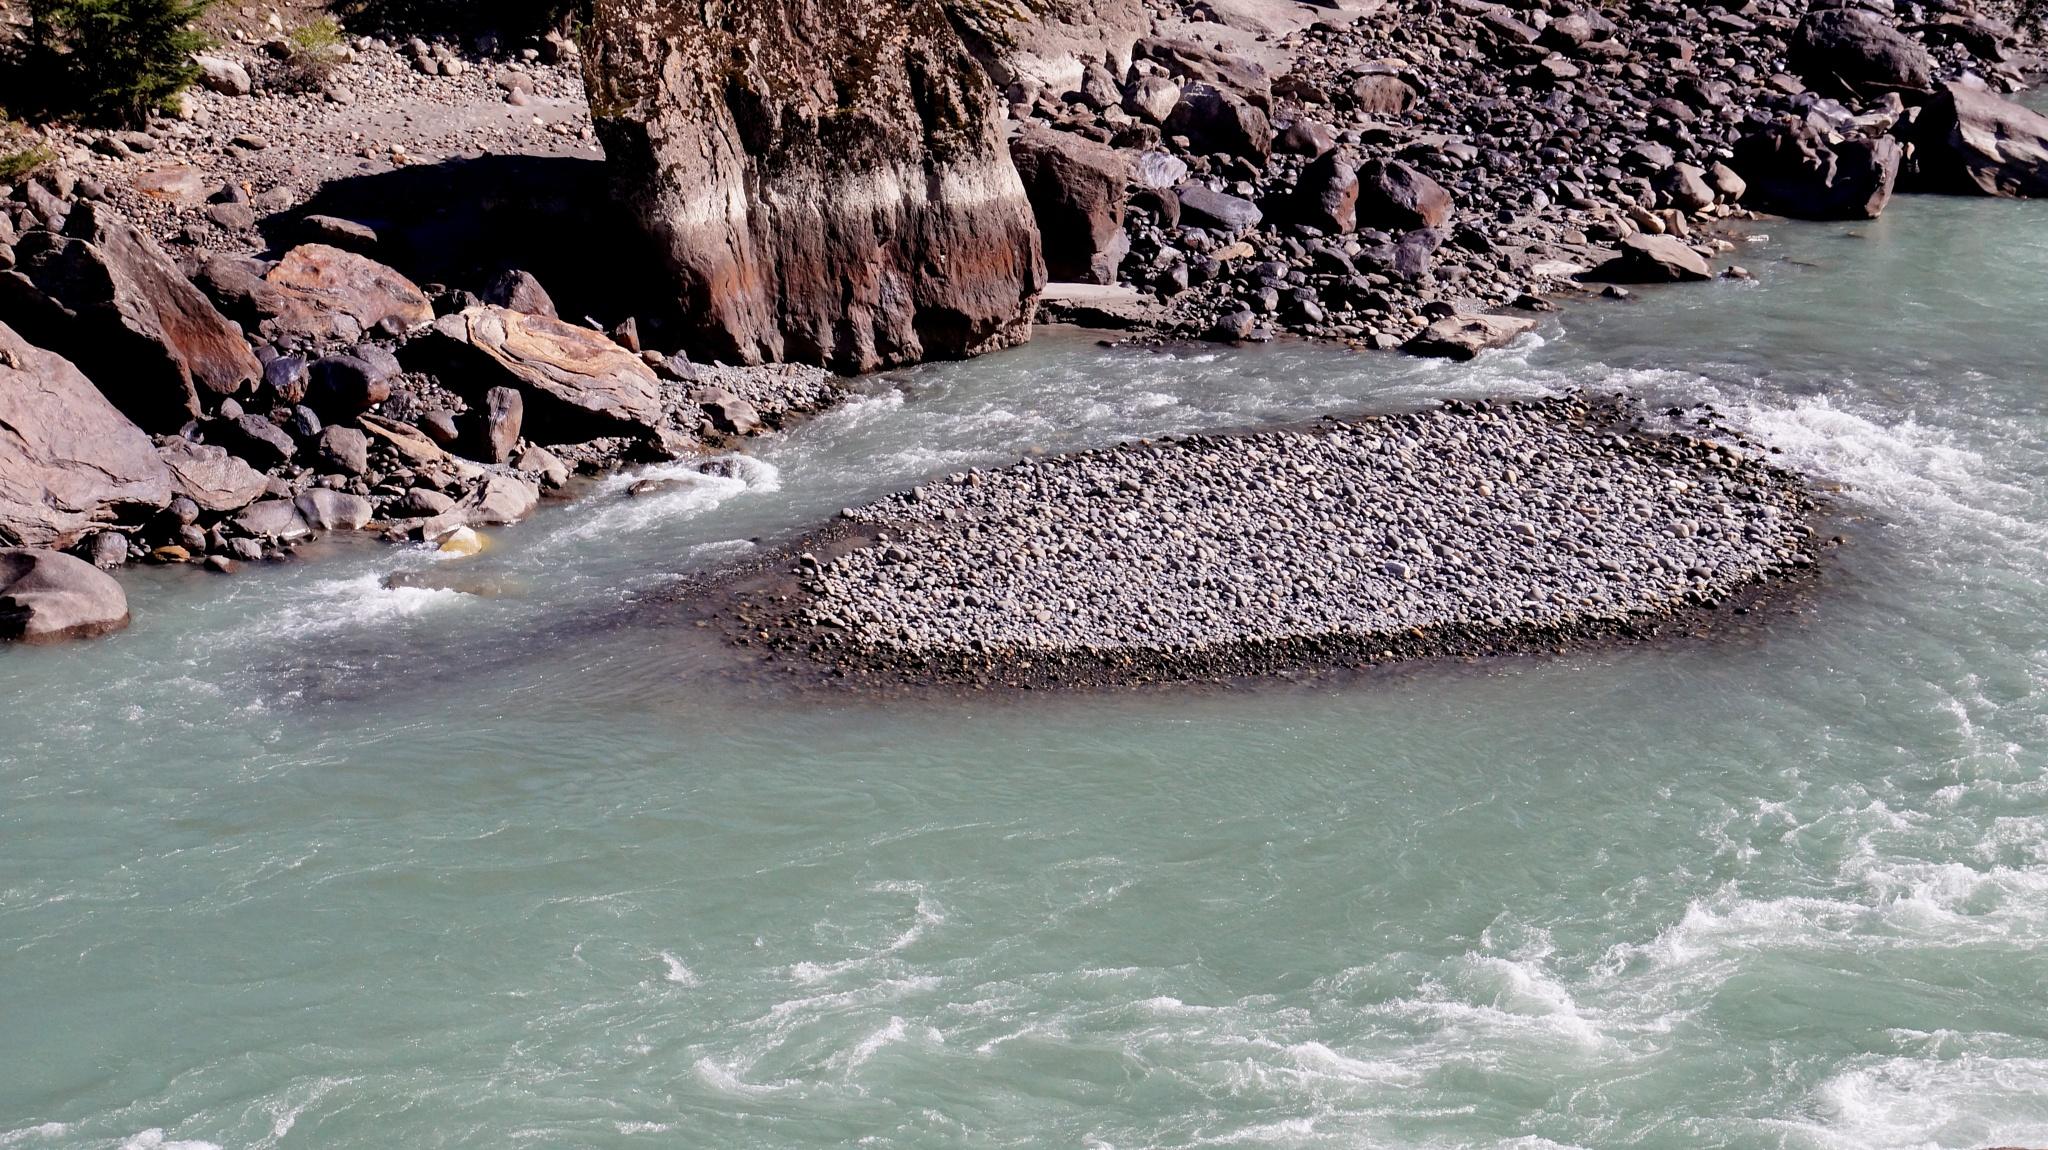 River Chandra Bhaga by saharajib